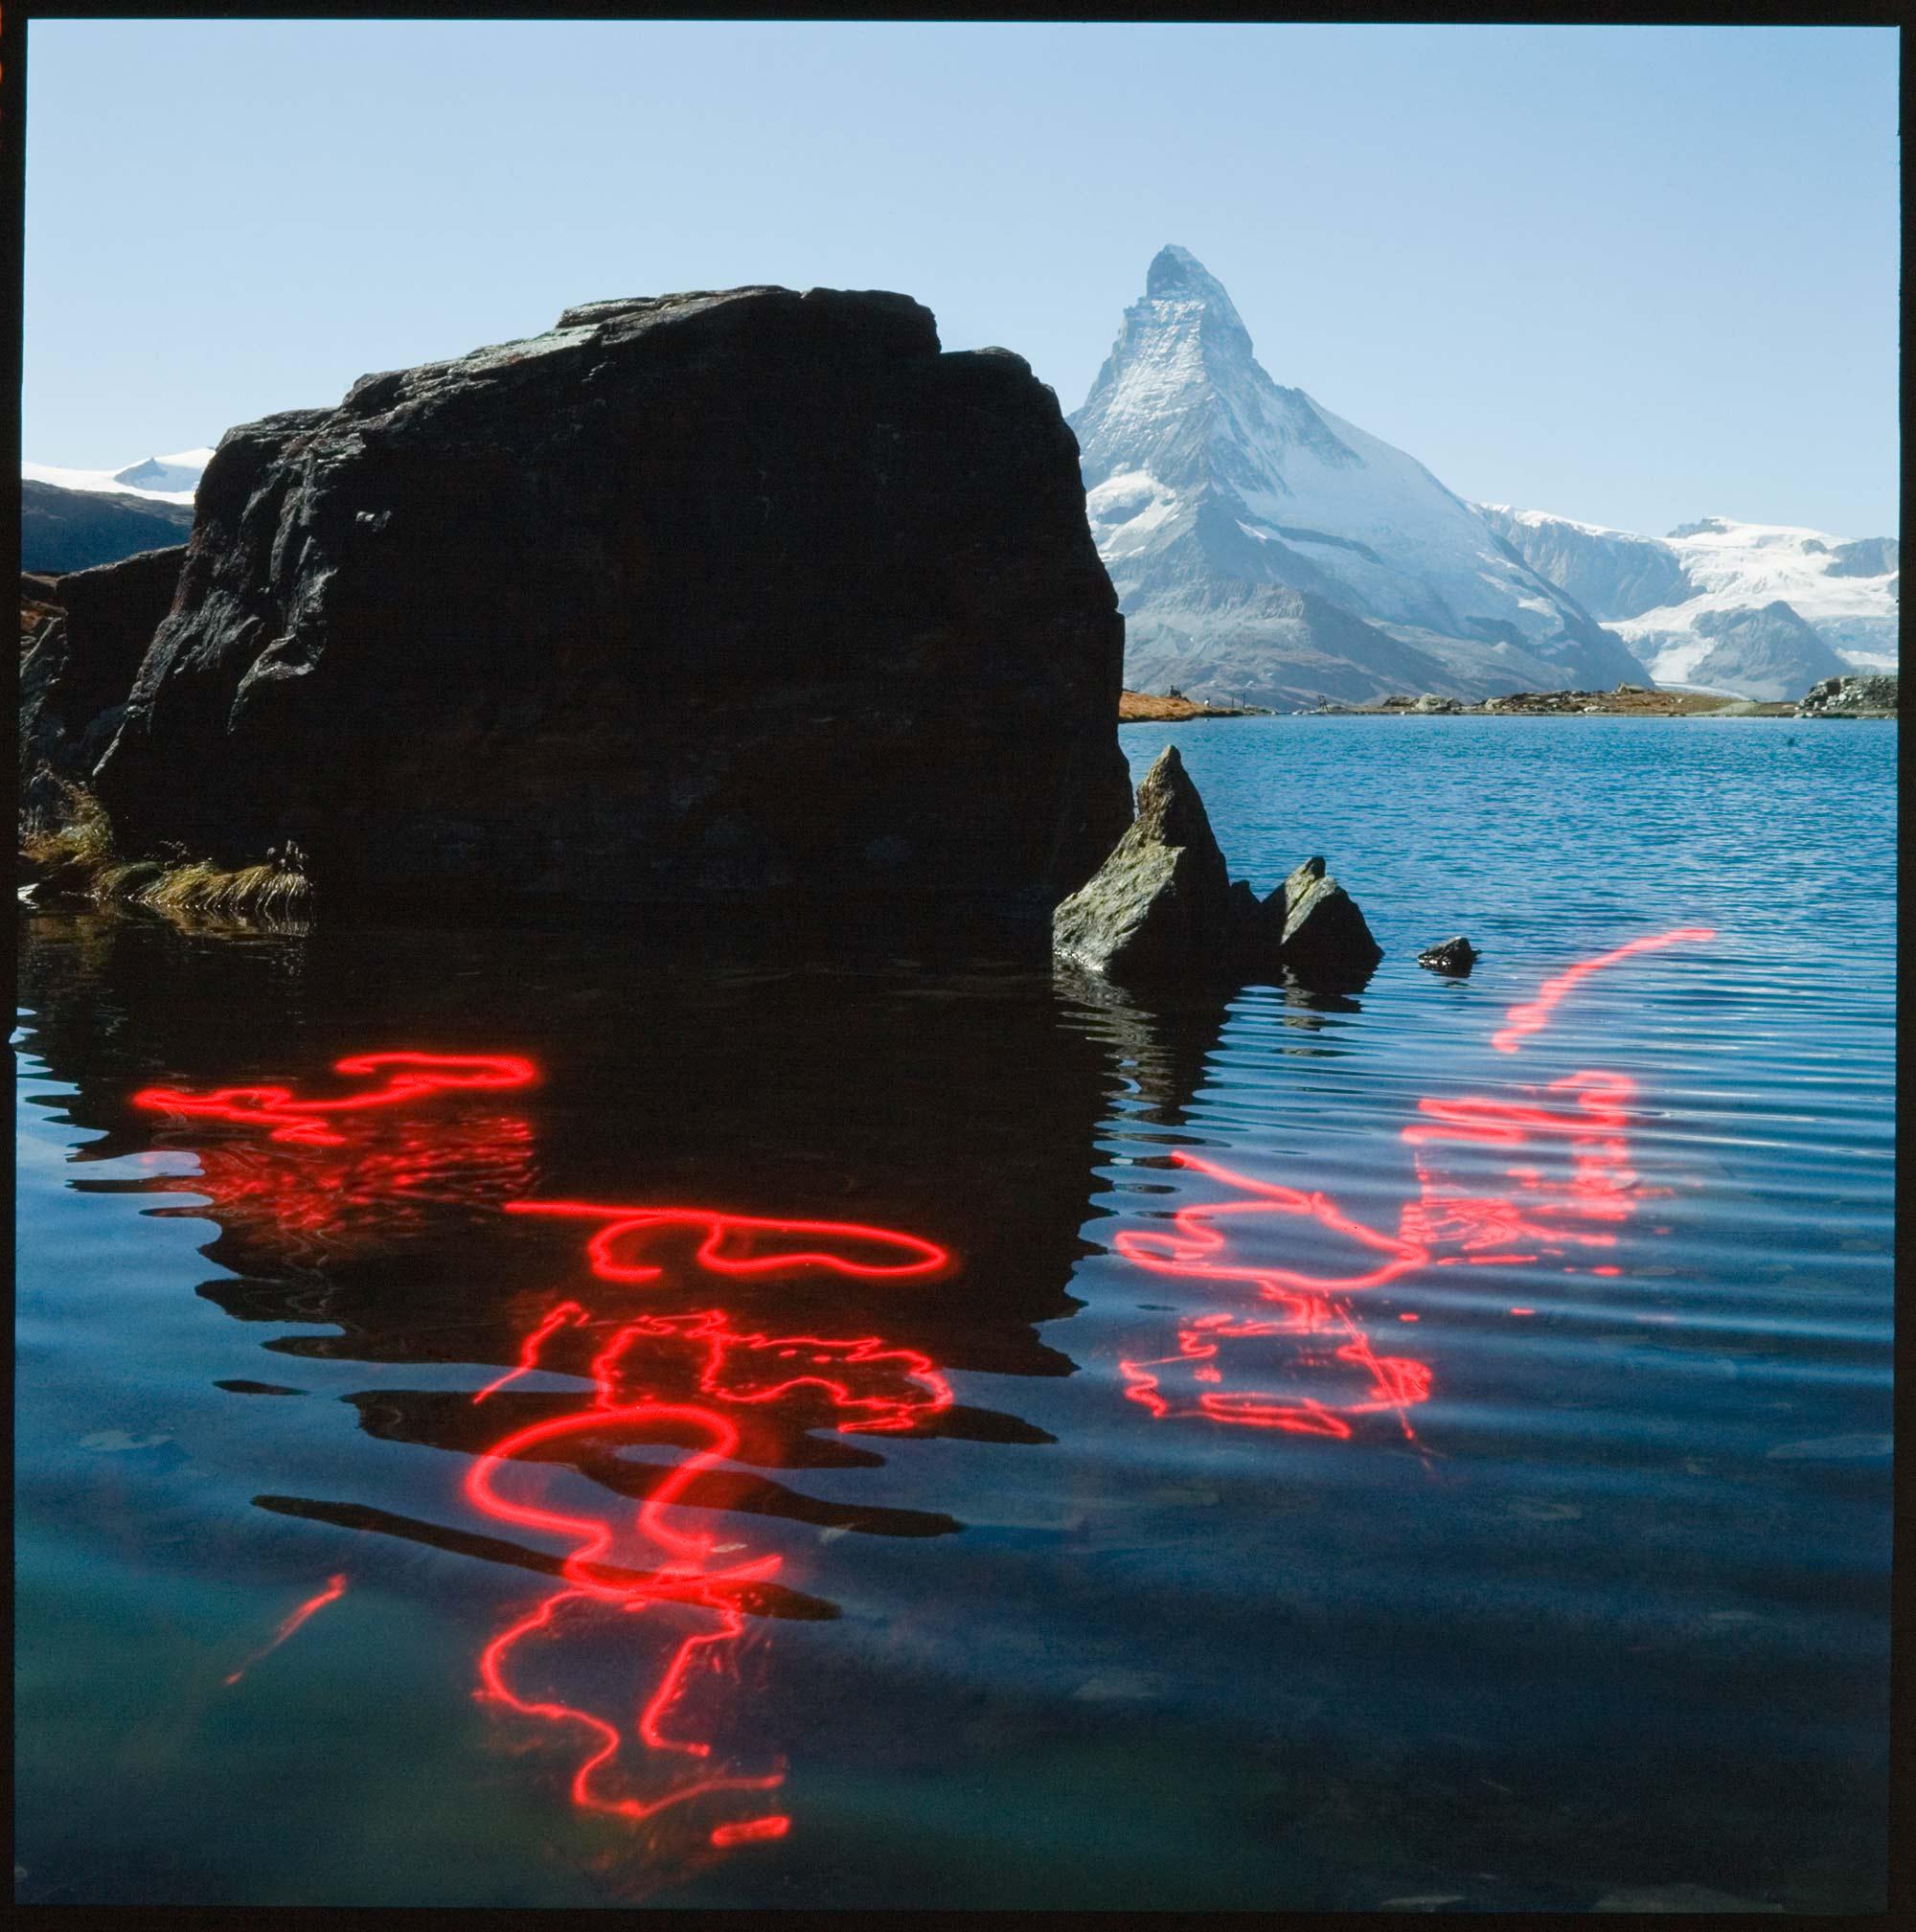 # 14 Graffiti rouges, 1984